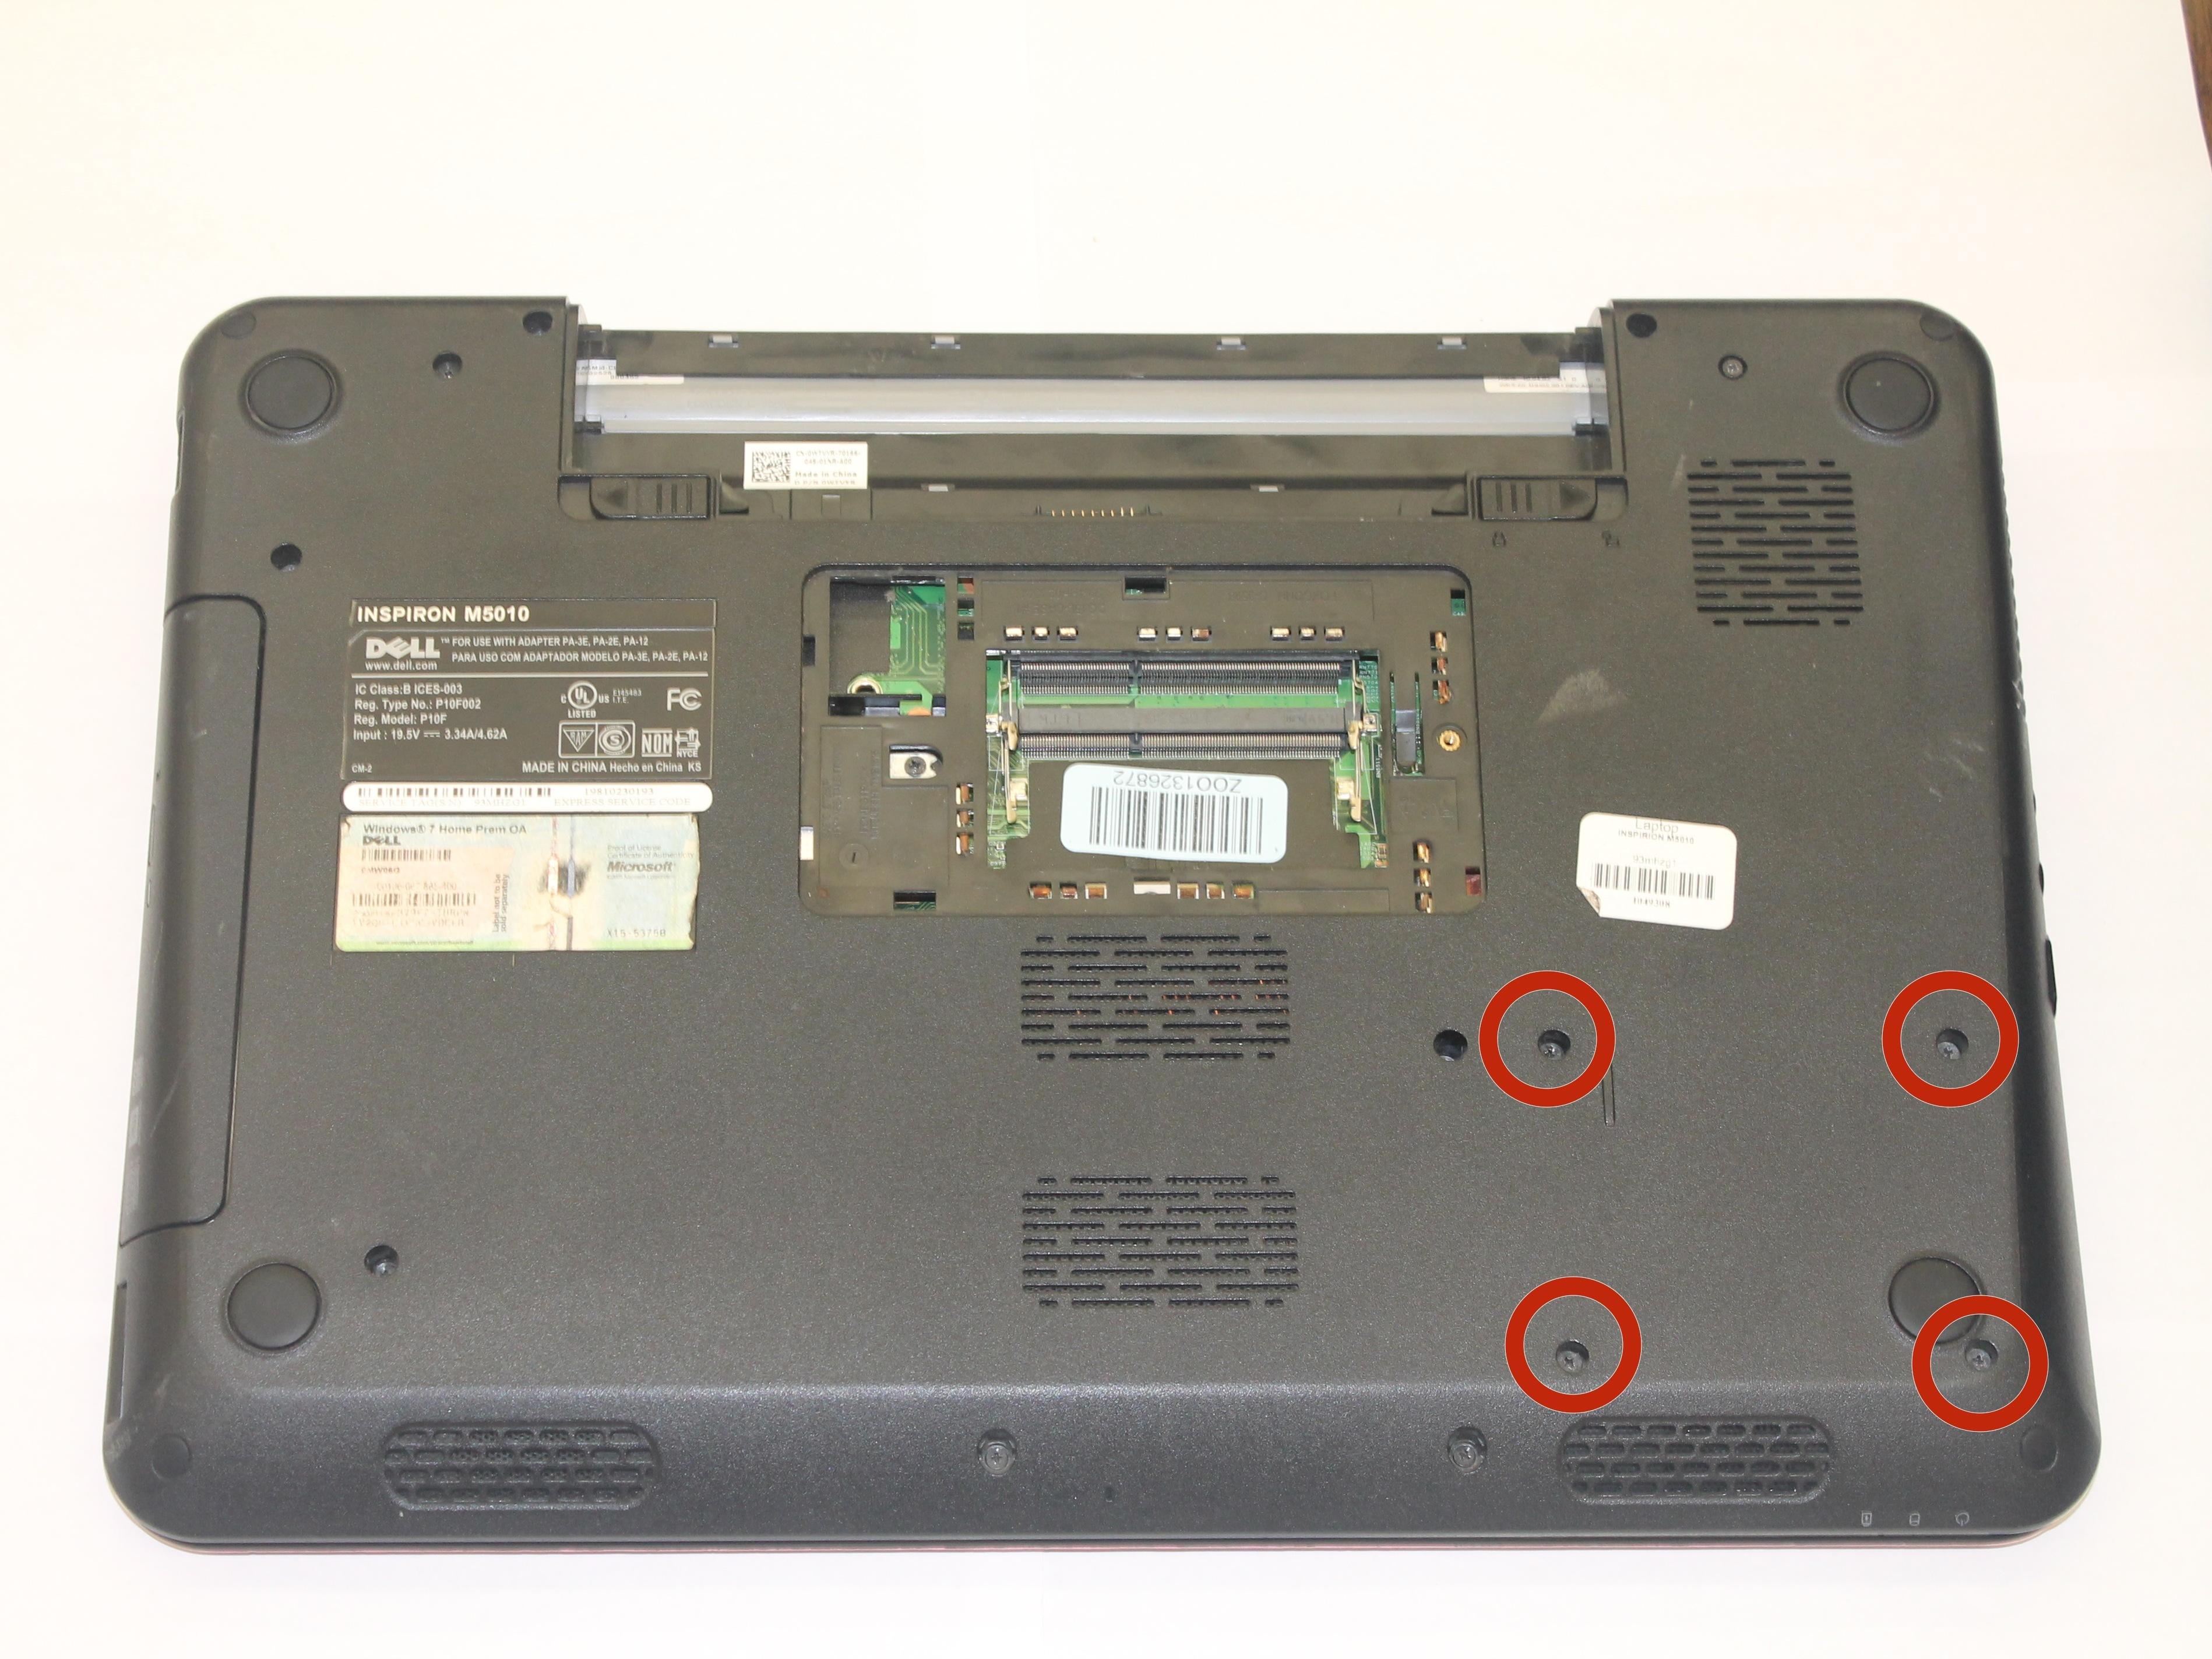 dell inspiron 15 m5010 repair ifixit rh ifixit com Dell Inspiron M5010 Manual Dell Inspiron M5010 Manual